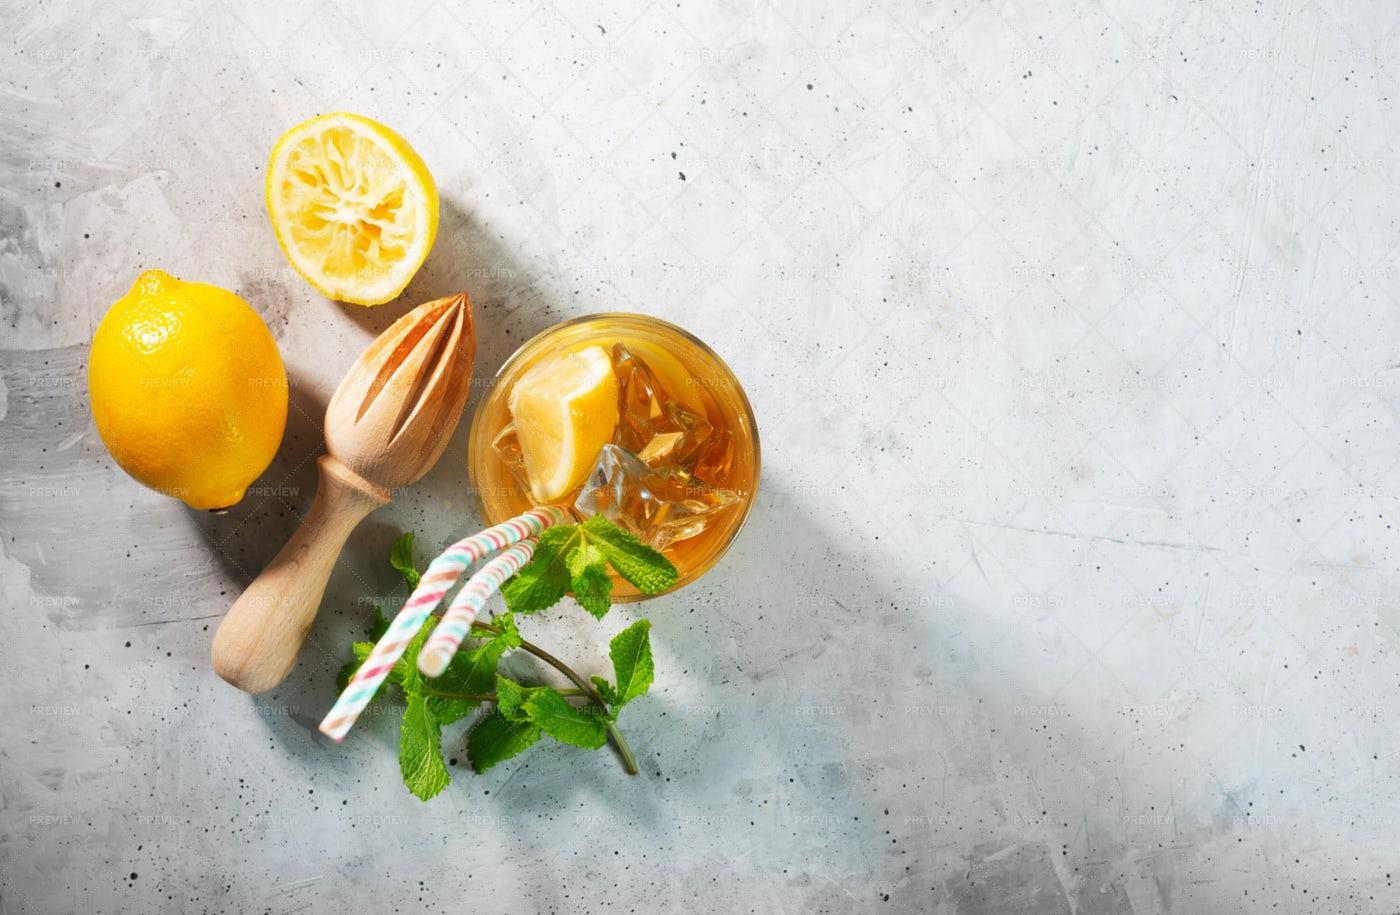 Lemon Ice Tea On Gray Background: Stock Photos